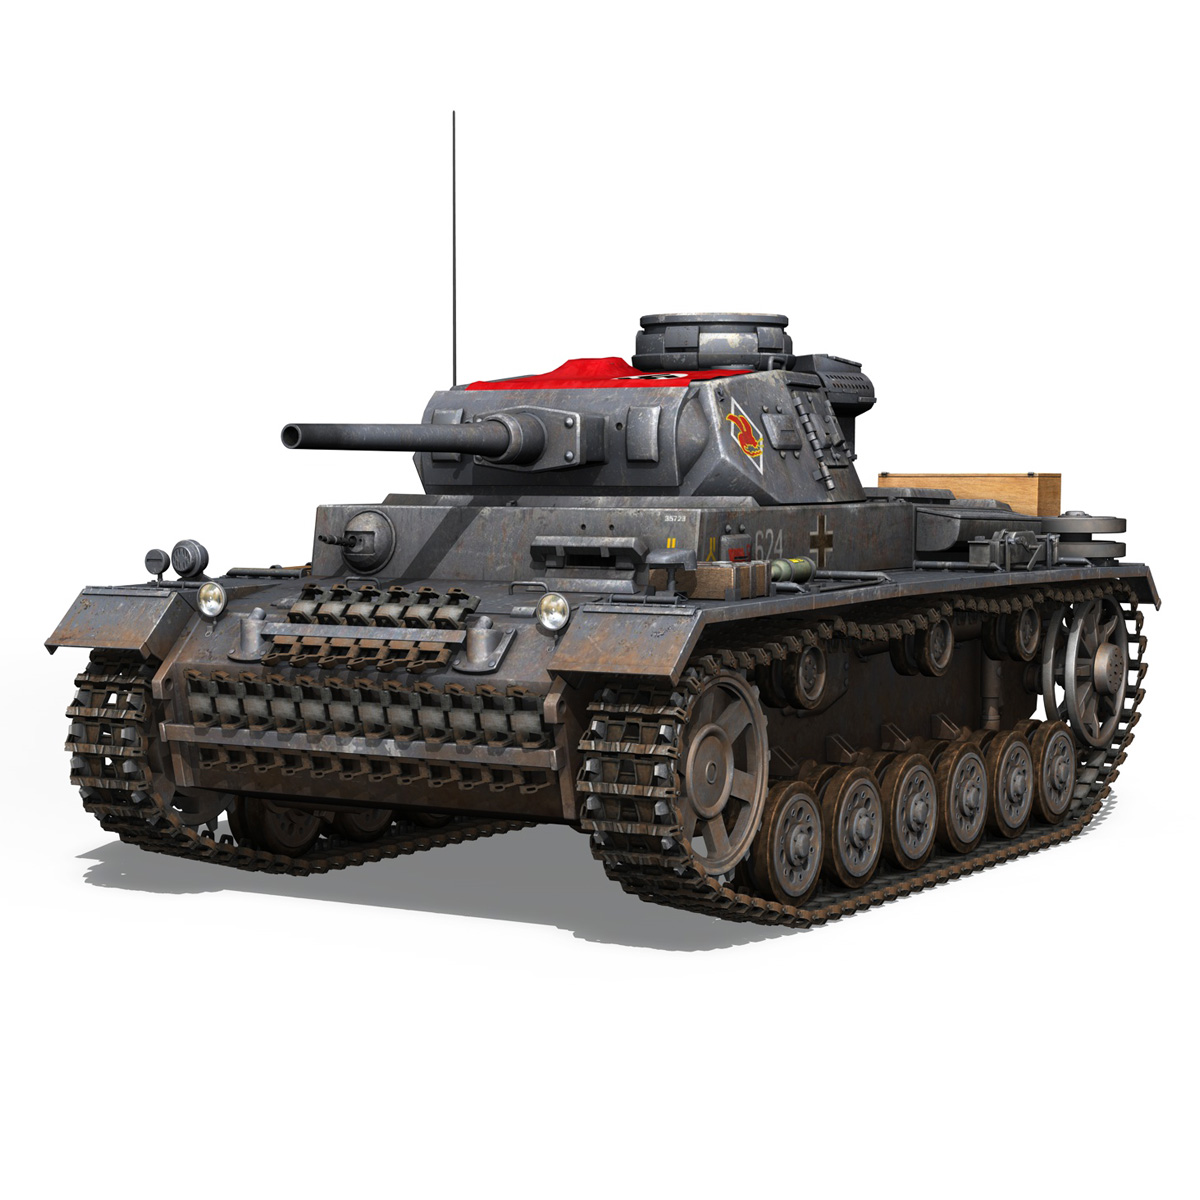 pzkpfw iii – panzer 3 – ausf.j – 624 3d model 3ds fbx lwo lw lws obj c4d 265299